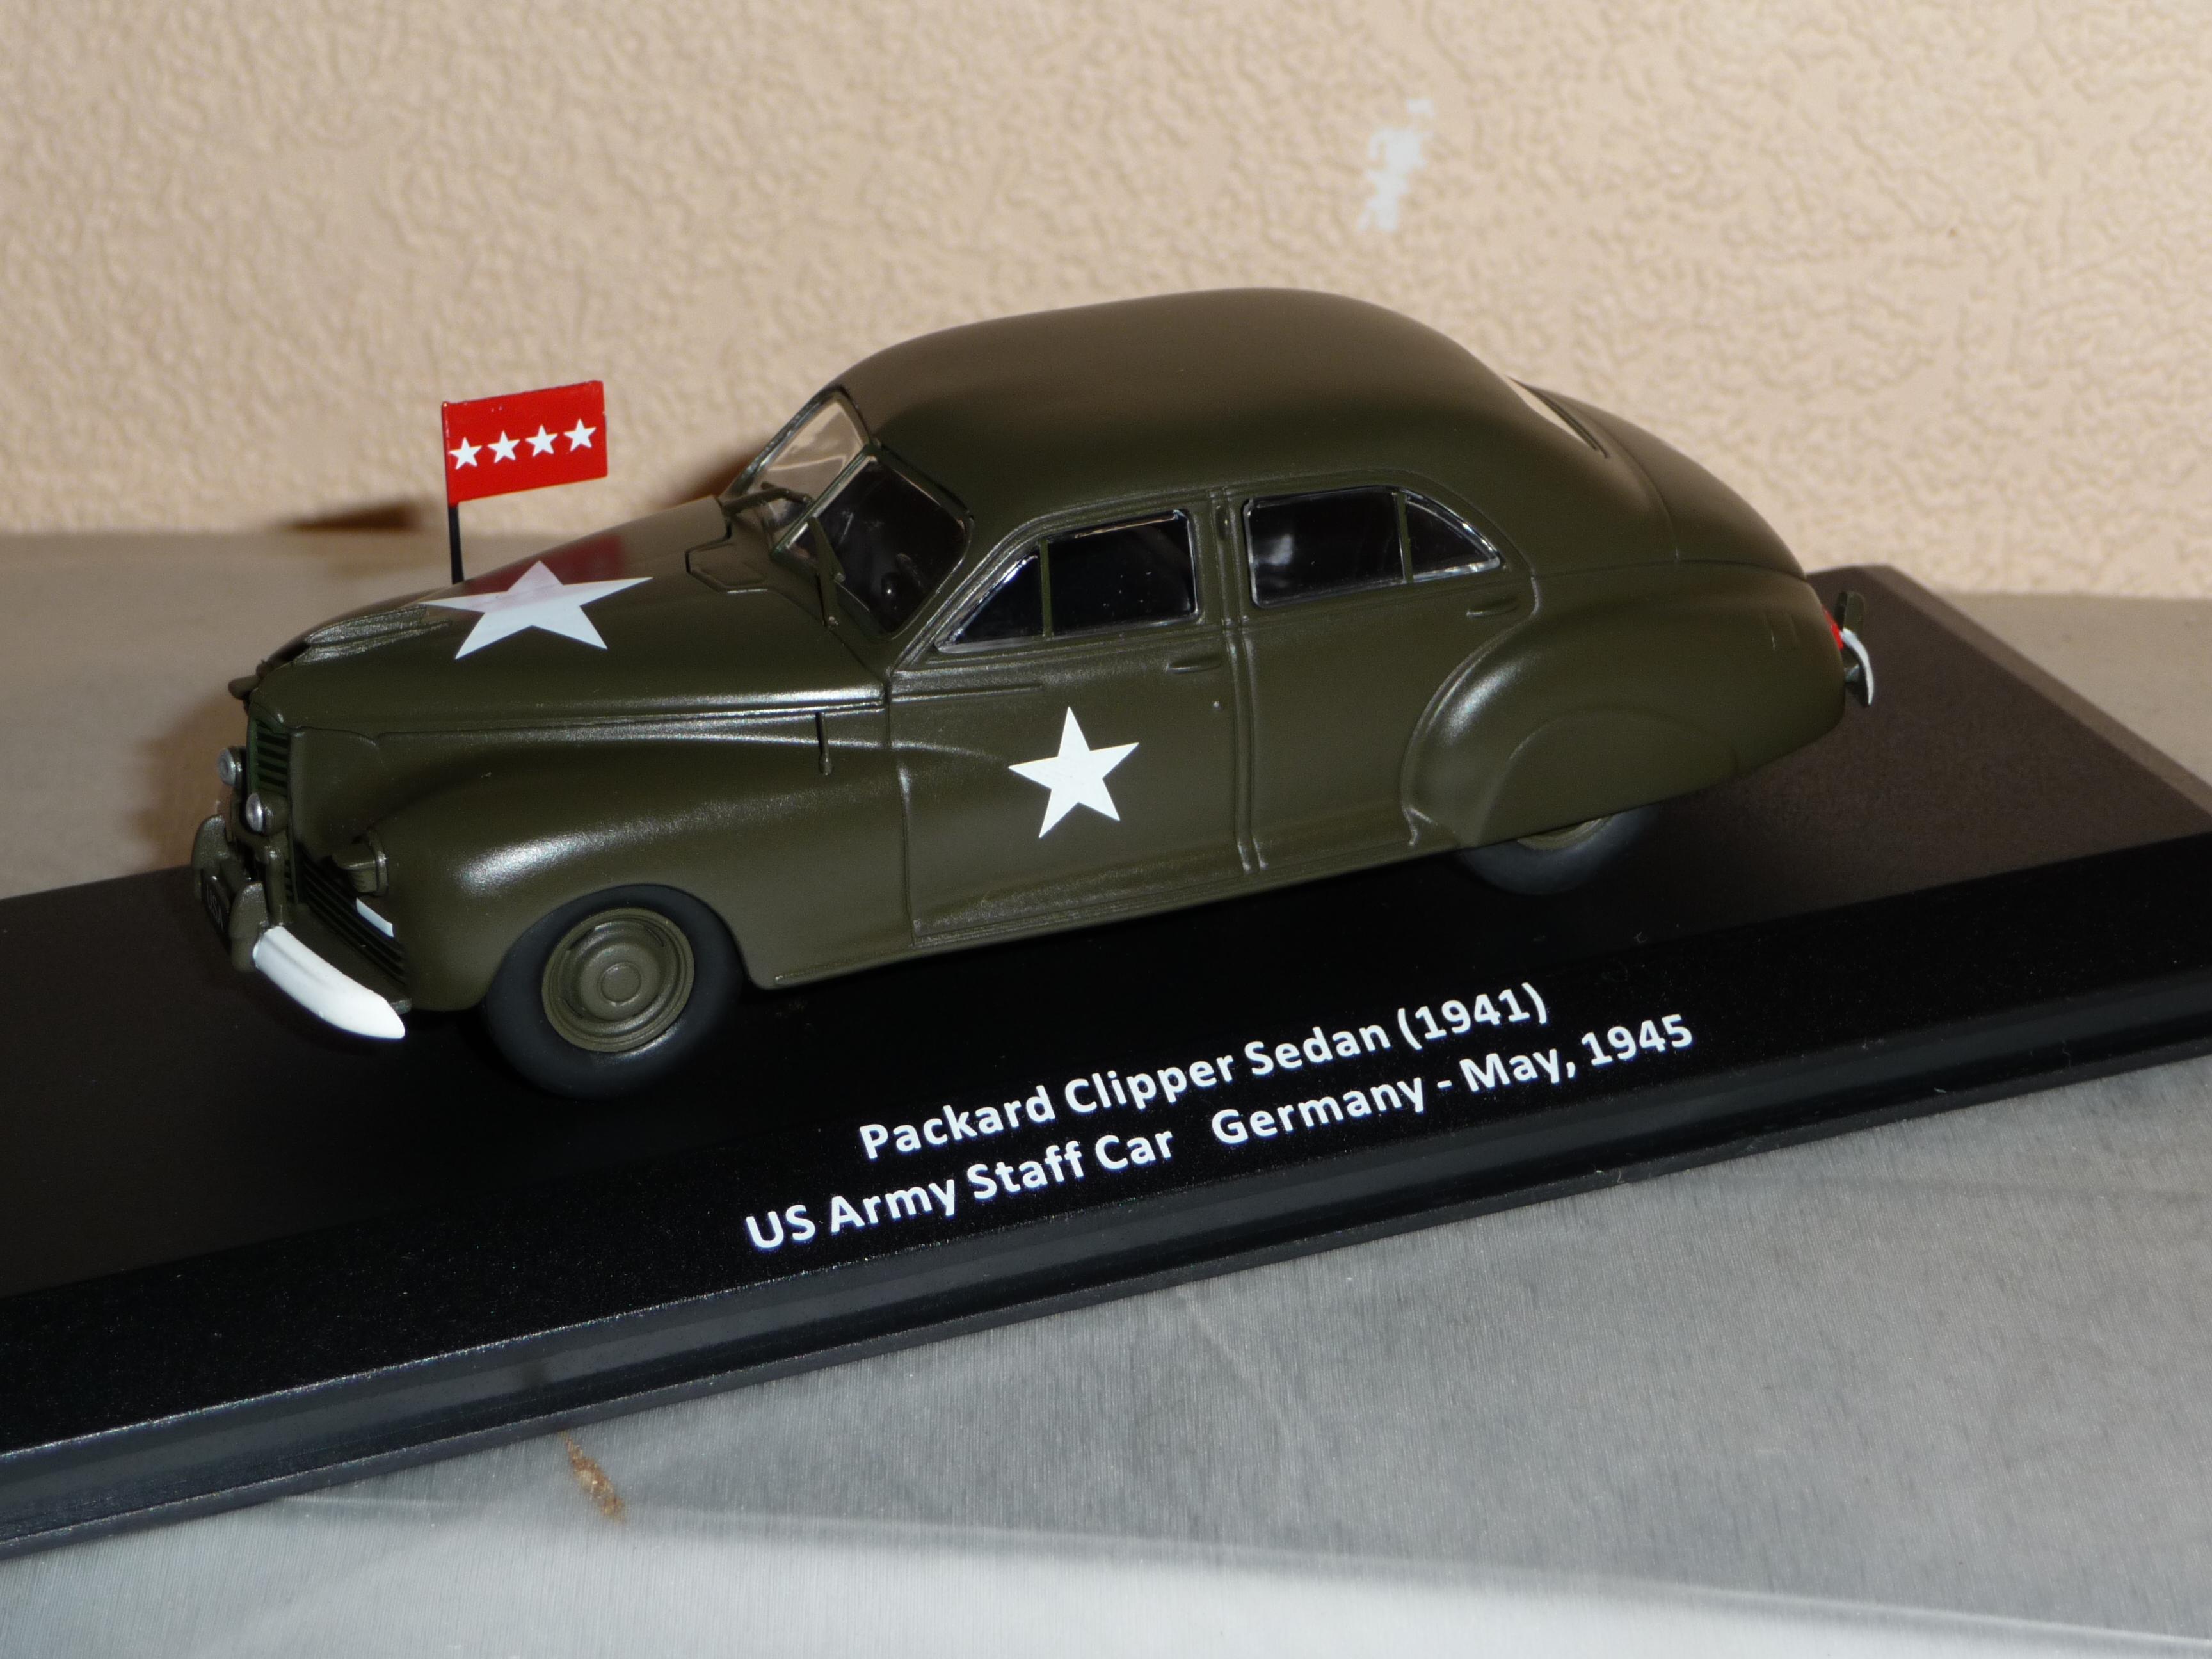 Packard Clipper Sedan Staff Car